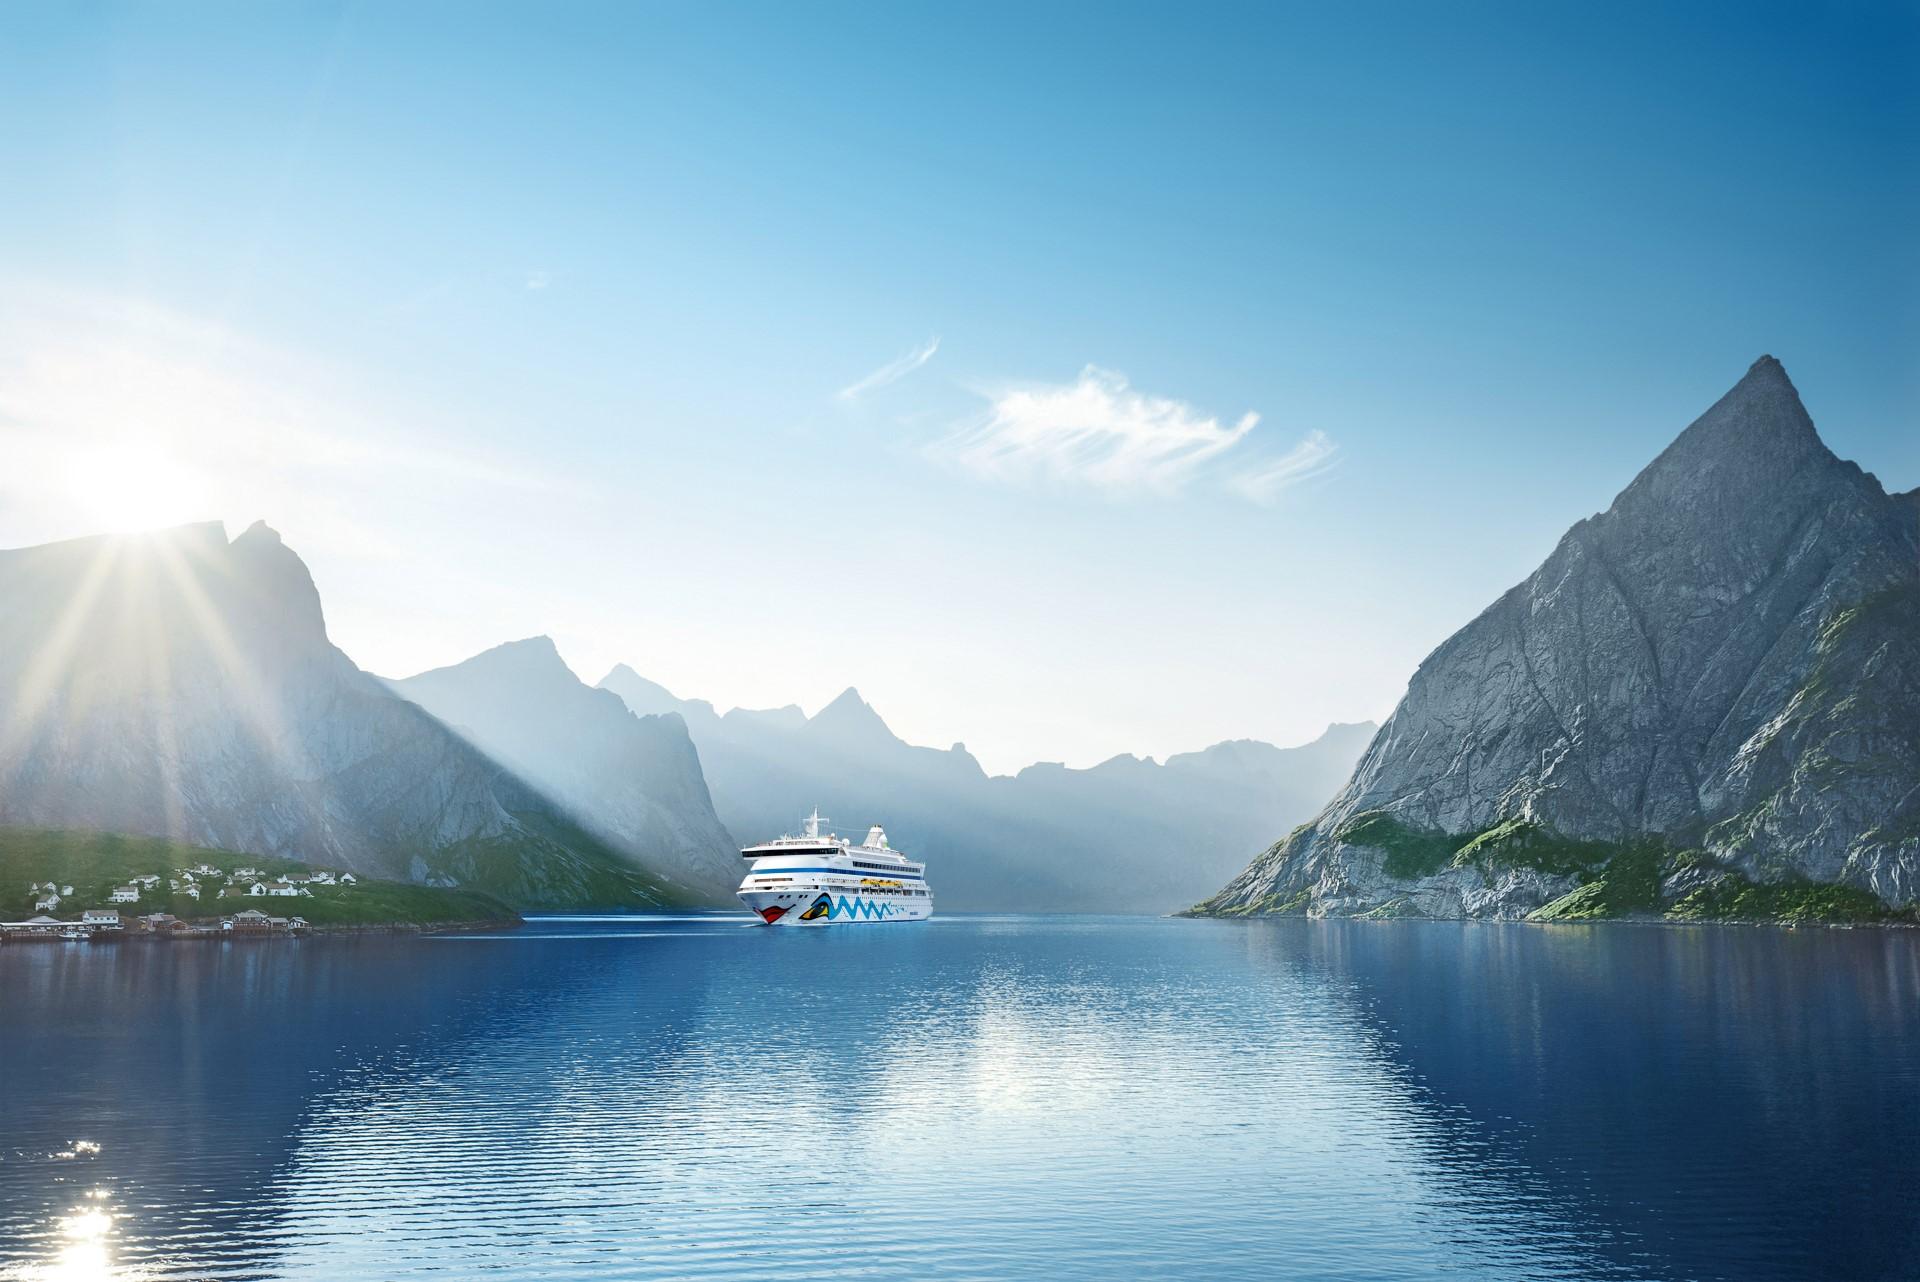 AIDA Fjord